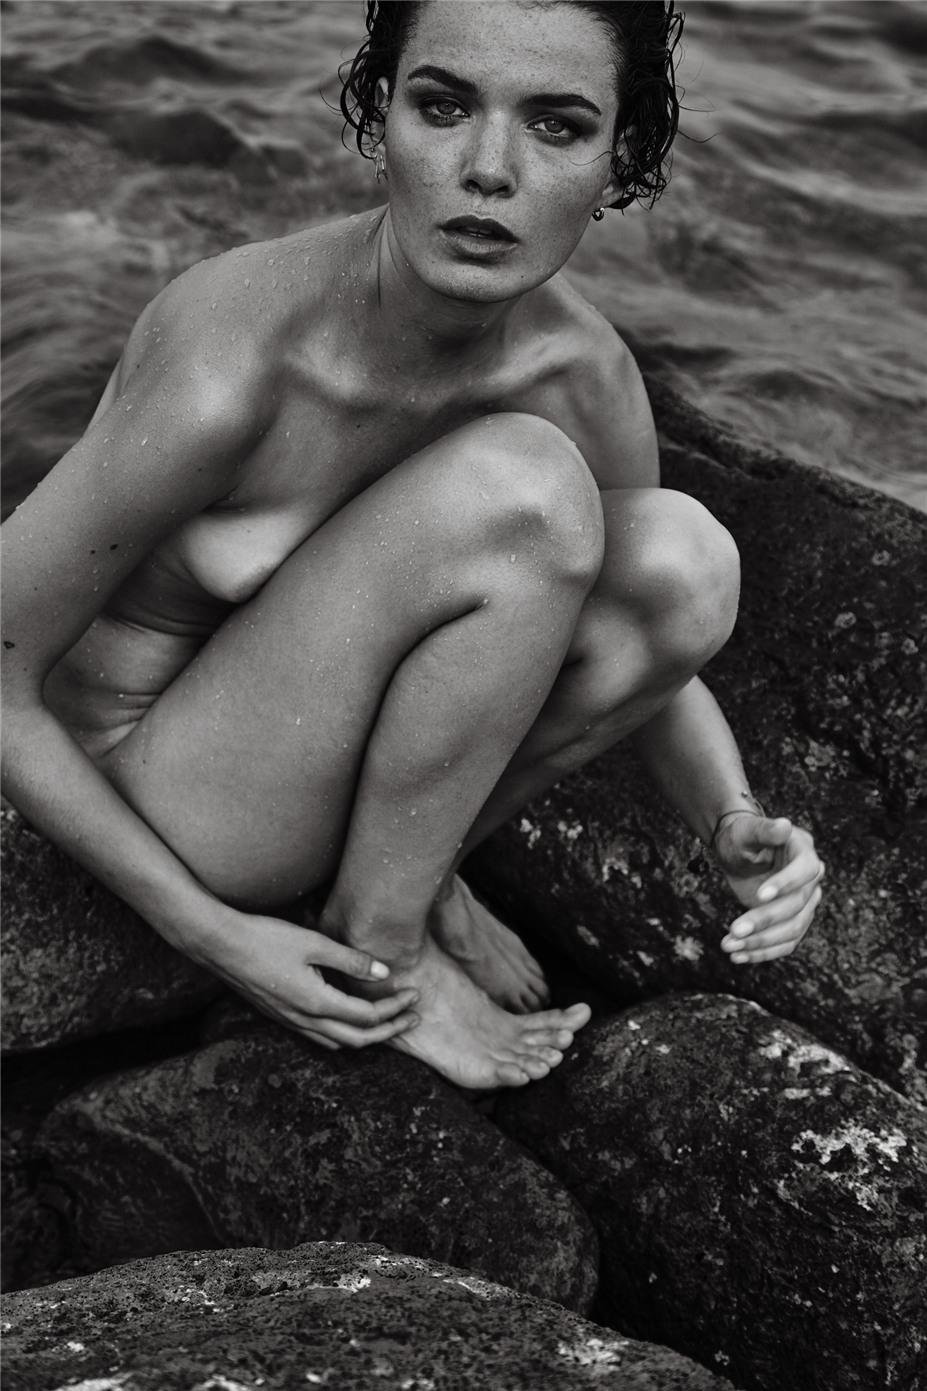 Обнаженные девушки на пляжах Ибицы / Ibiza Nudes by Diane Betties - Anne Verhallen